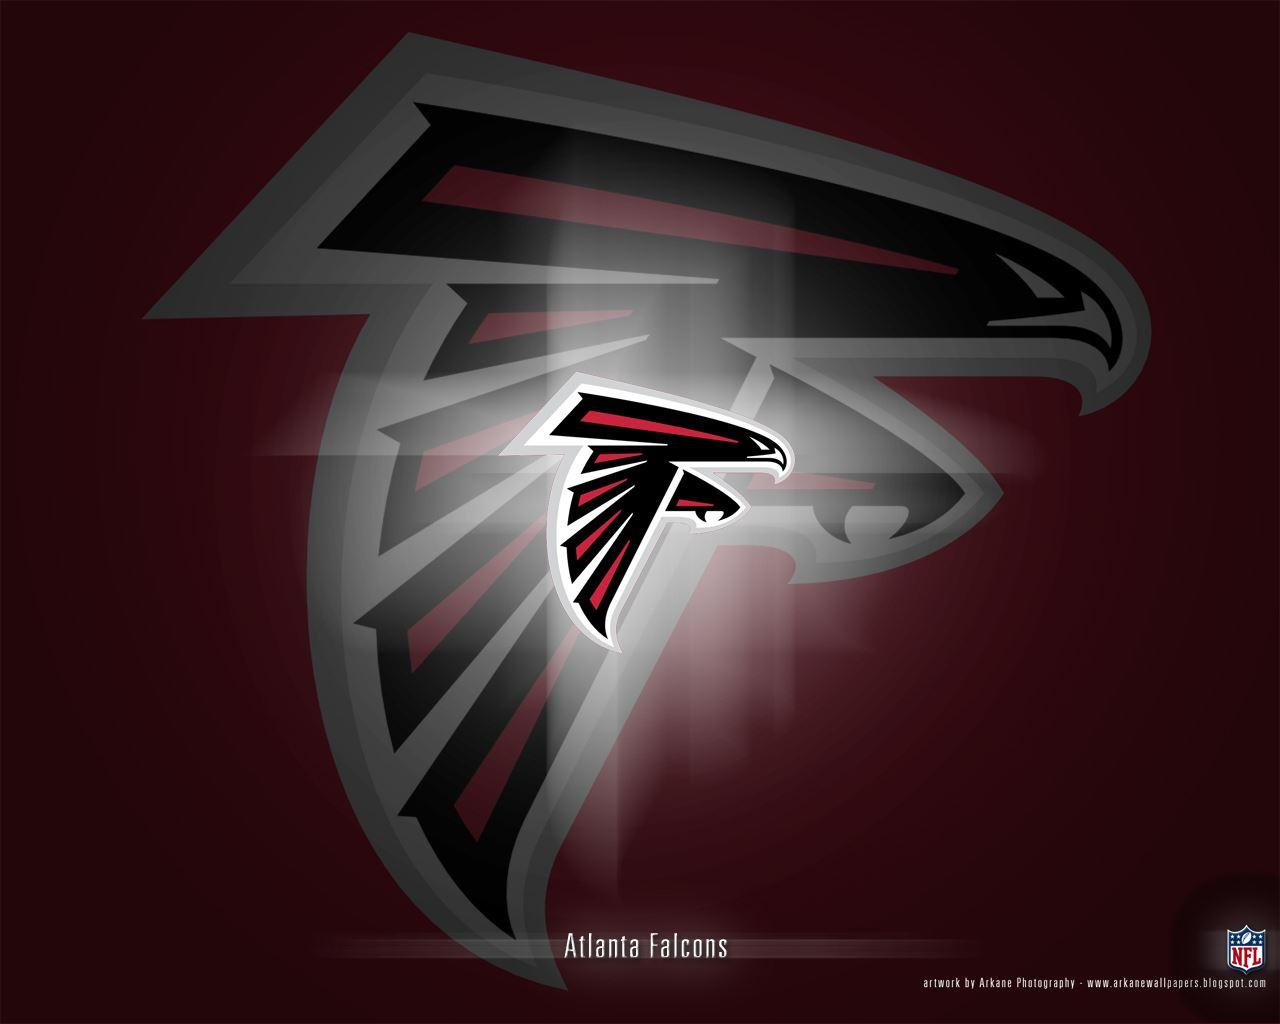 10u Select - LG Falcons